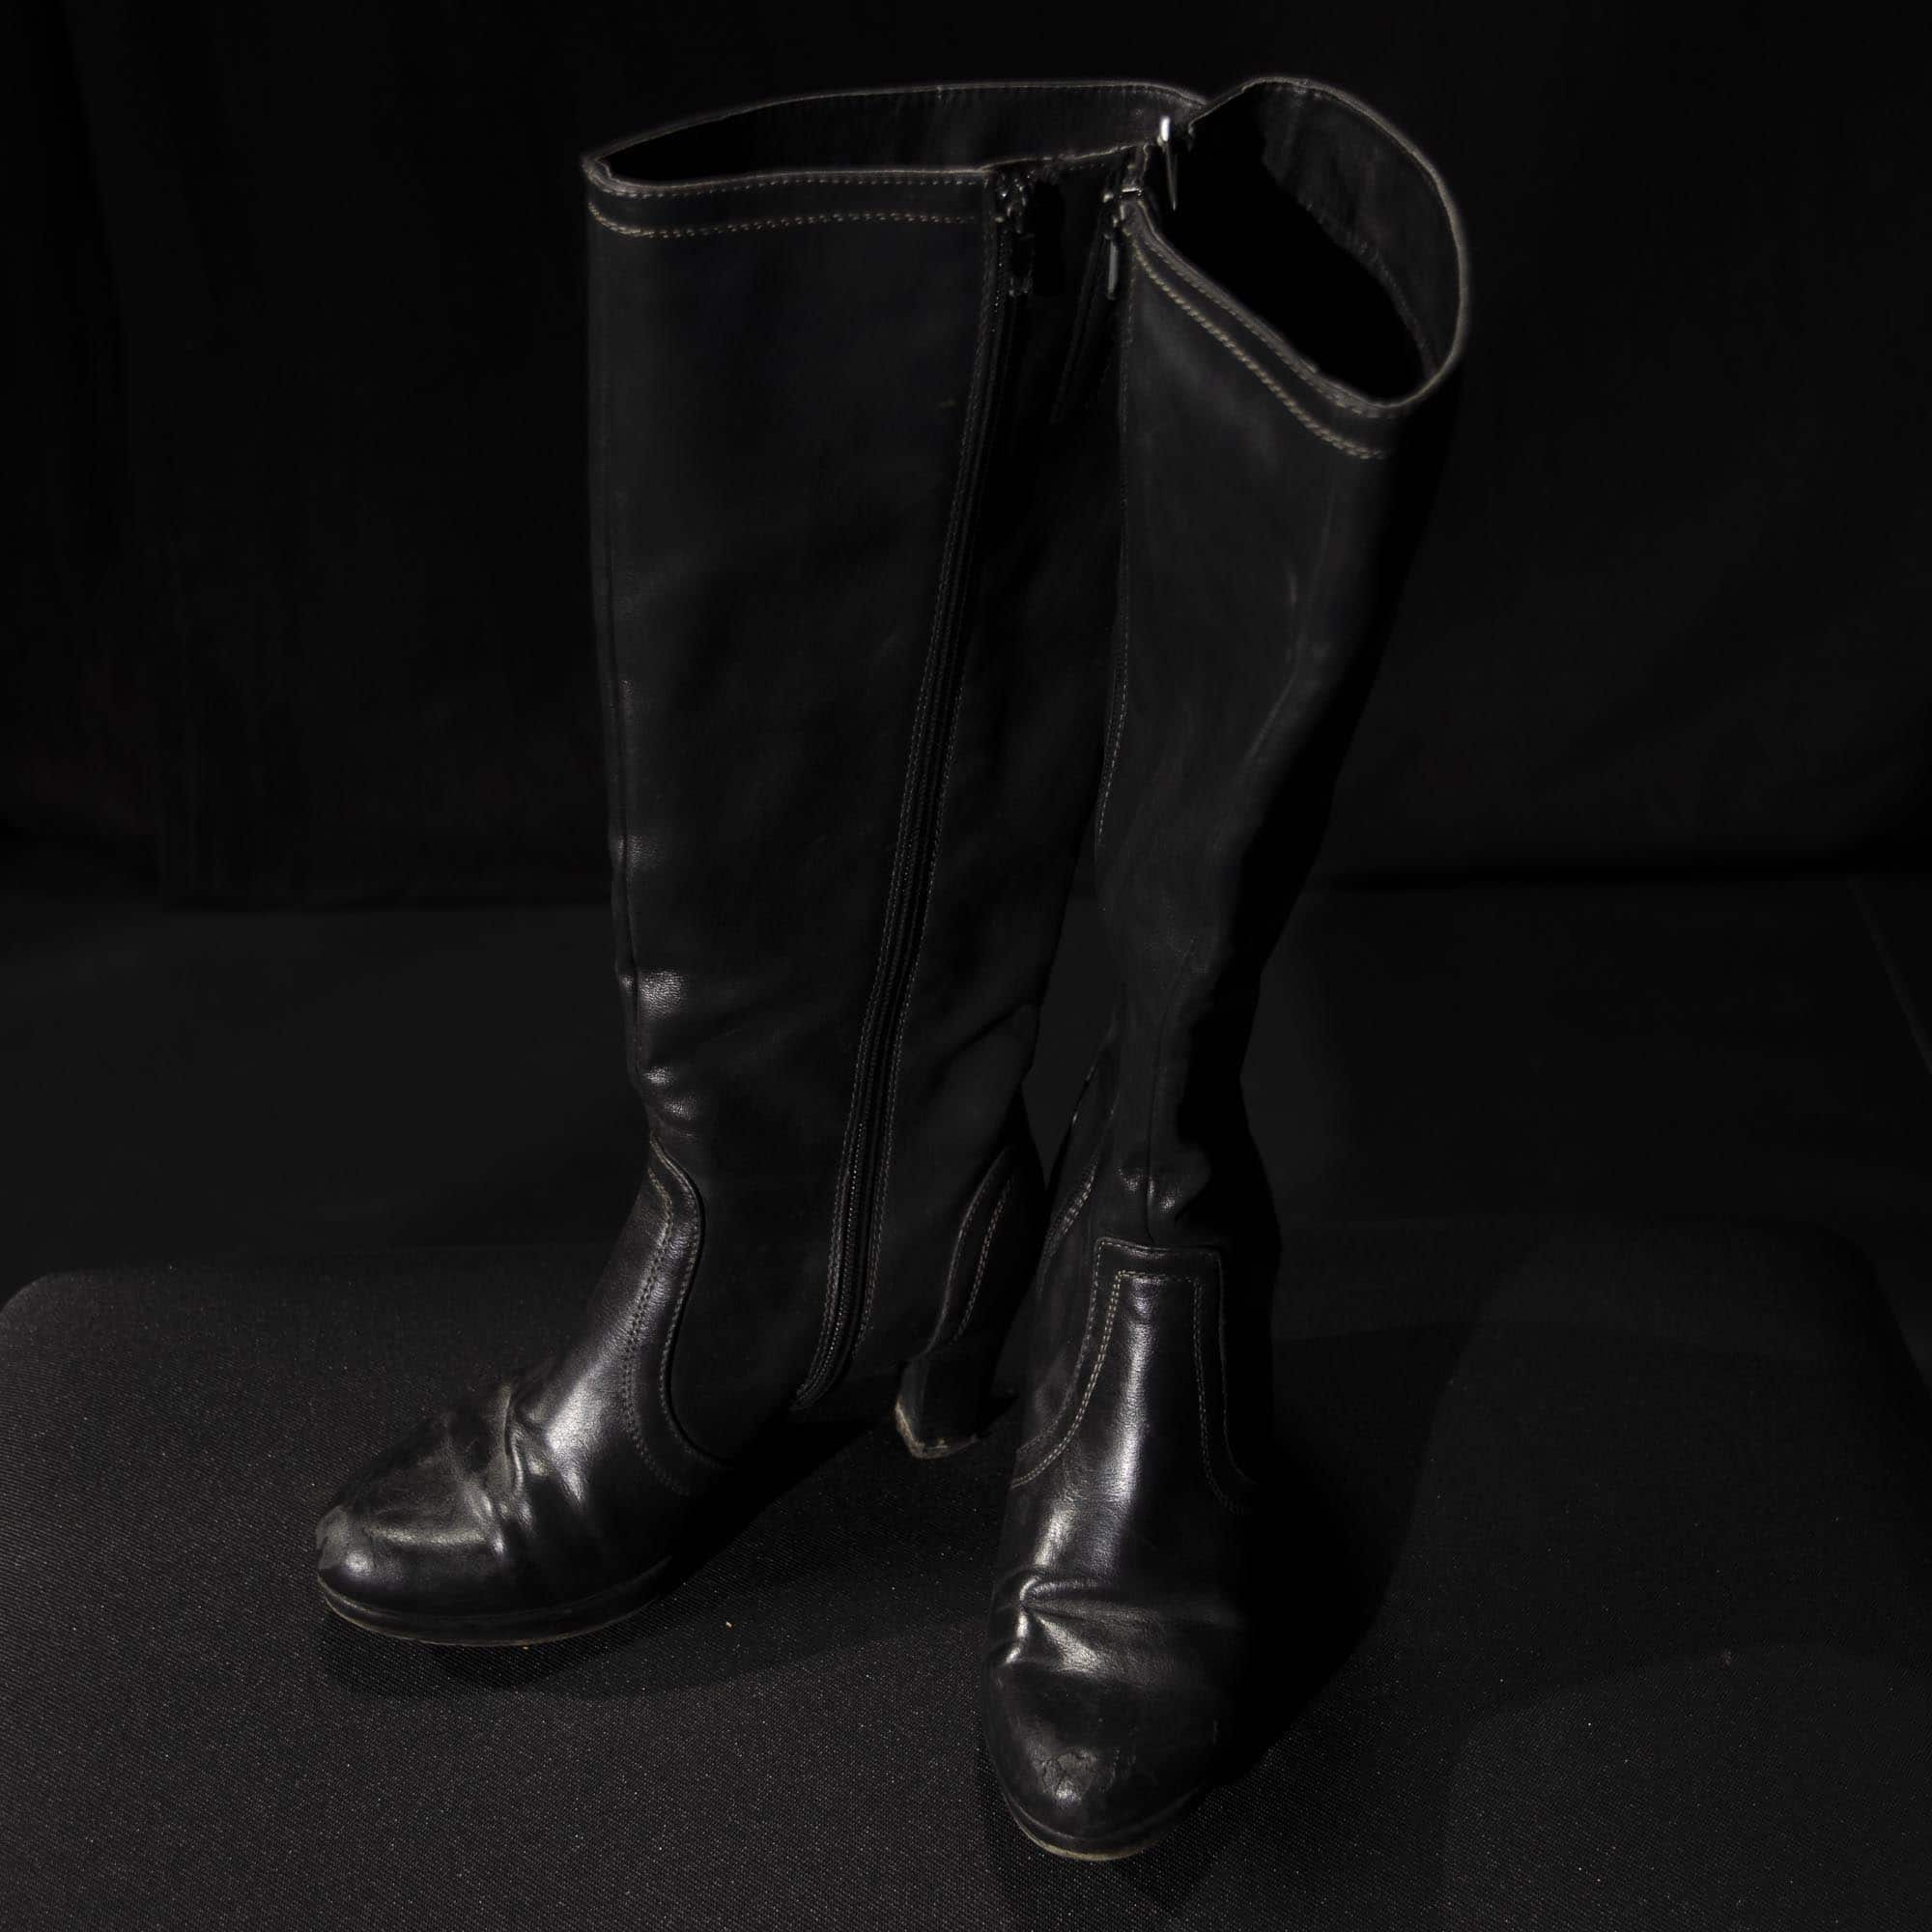 Stiefel SD023